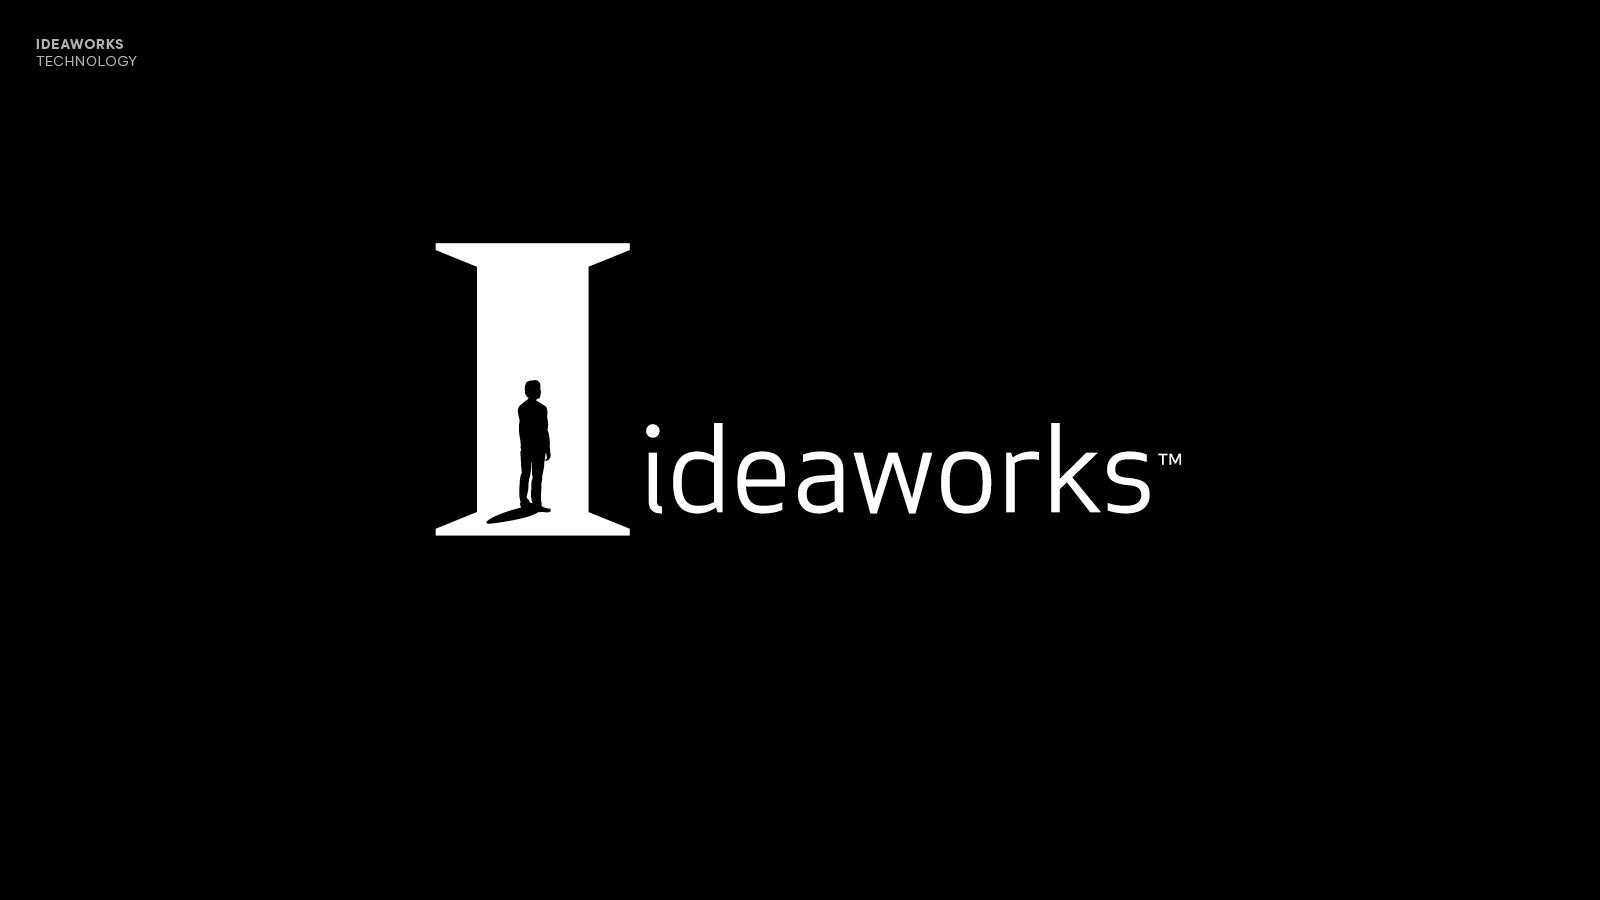 logos-designer-brand-identity-projects-graphics-studio-milton-keynes-london-13